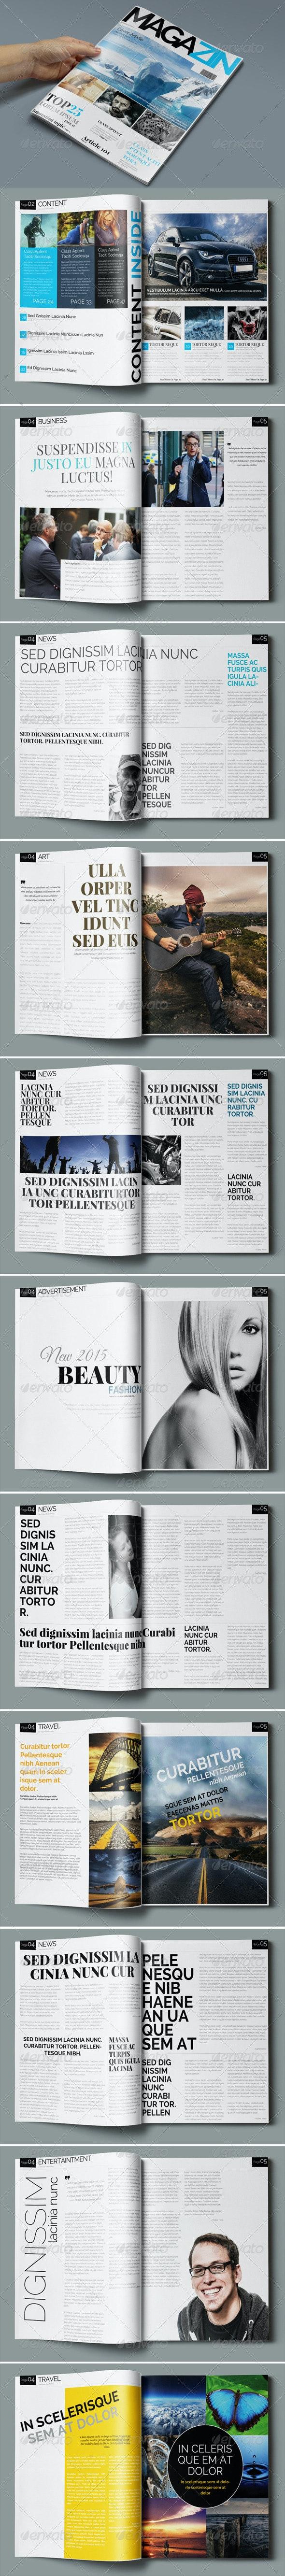 News Magazine Template - Magazines Print Templates